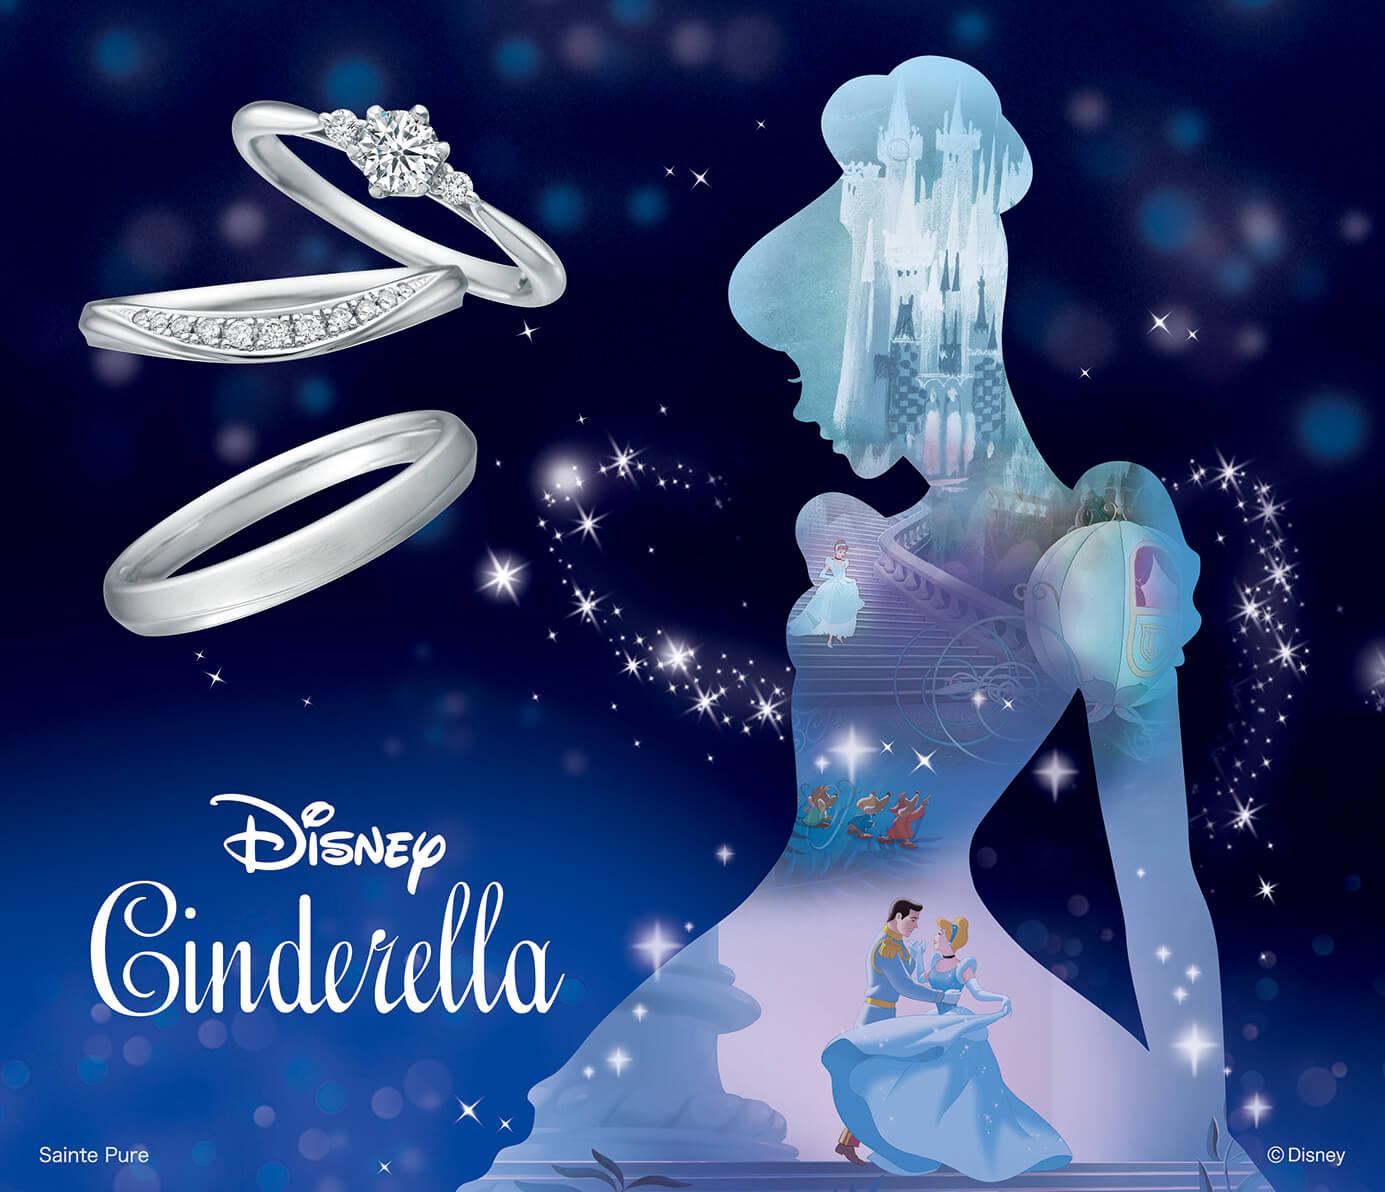 Disneyシンデレラ2022の婚約指輪エンゲージリングと結婚指輪マリッジリングのYouremyPrincessユーアーマイプリンセス